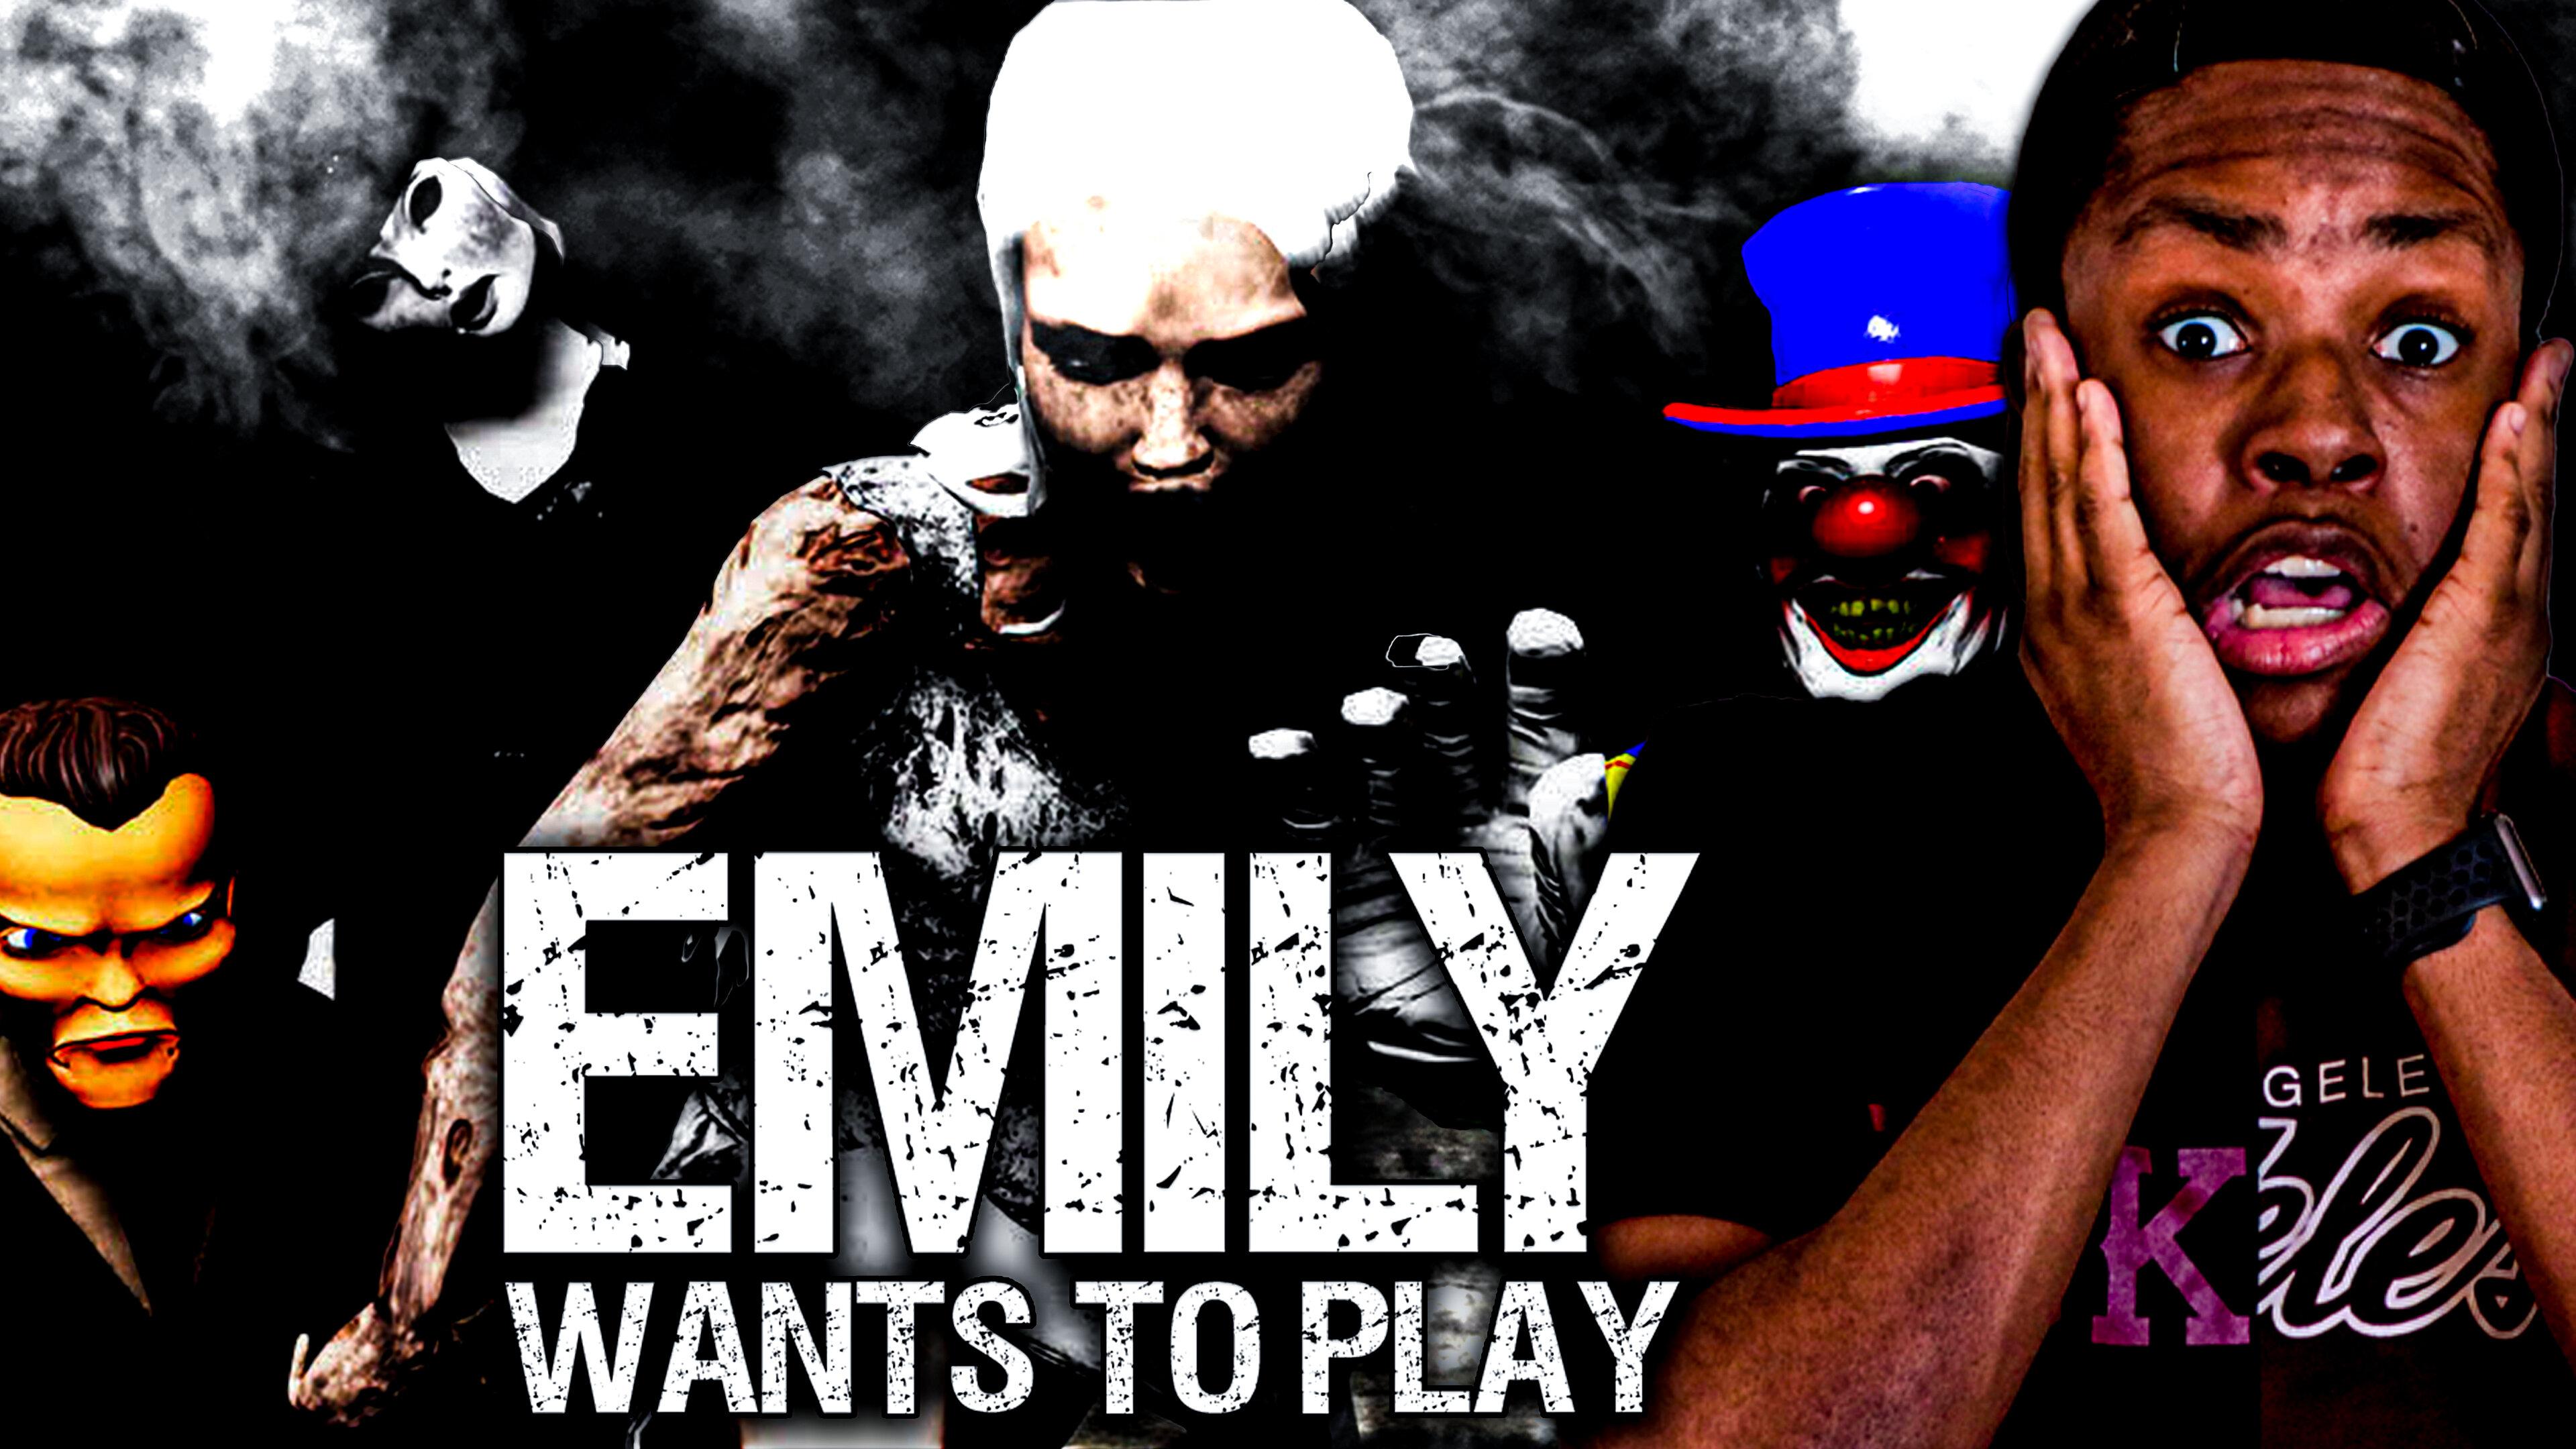 Trent's Emily Wants To Play Walkthrough